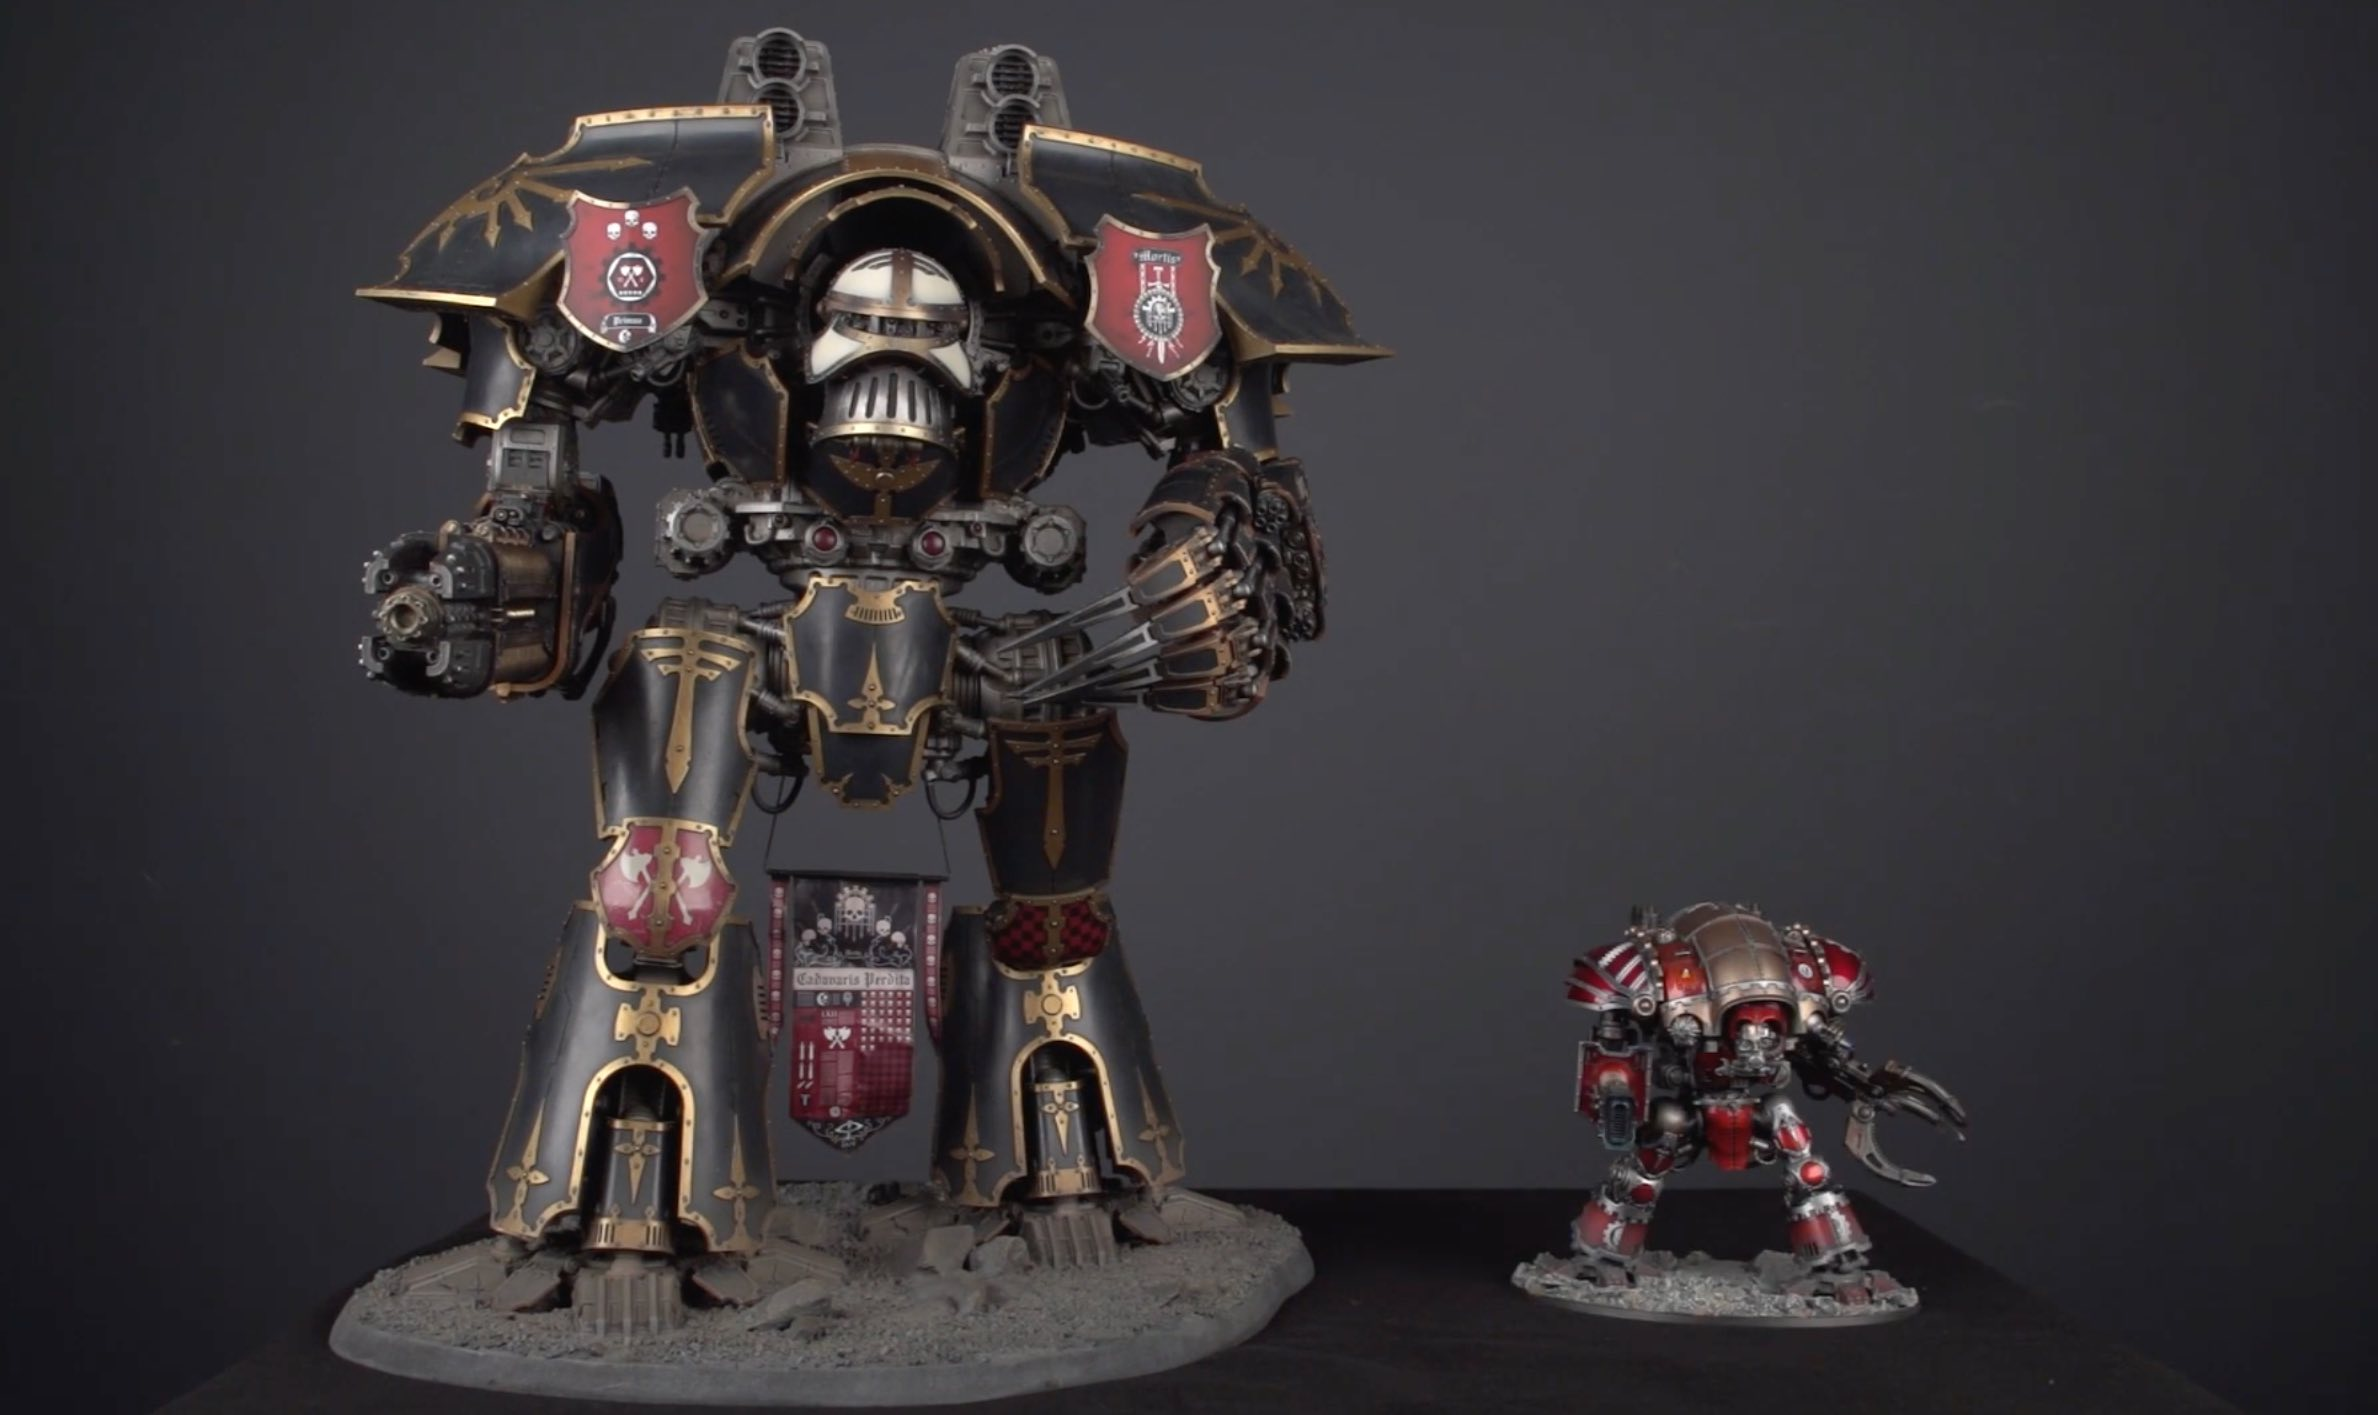 Warlord vs Knight